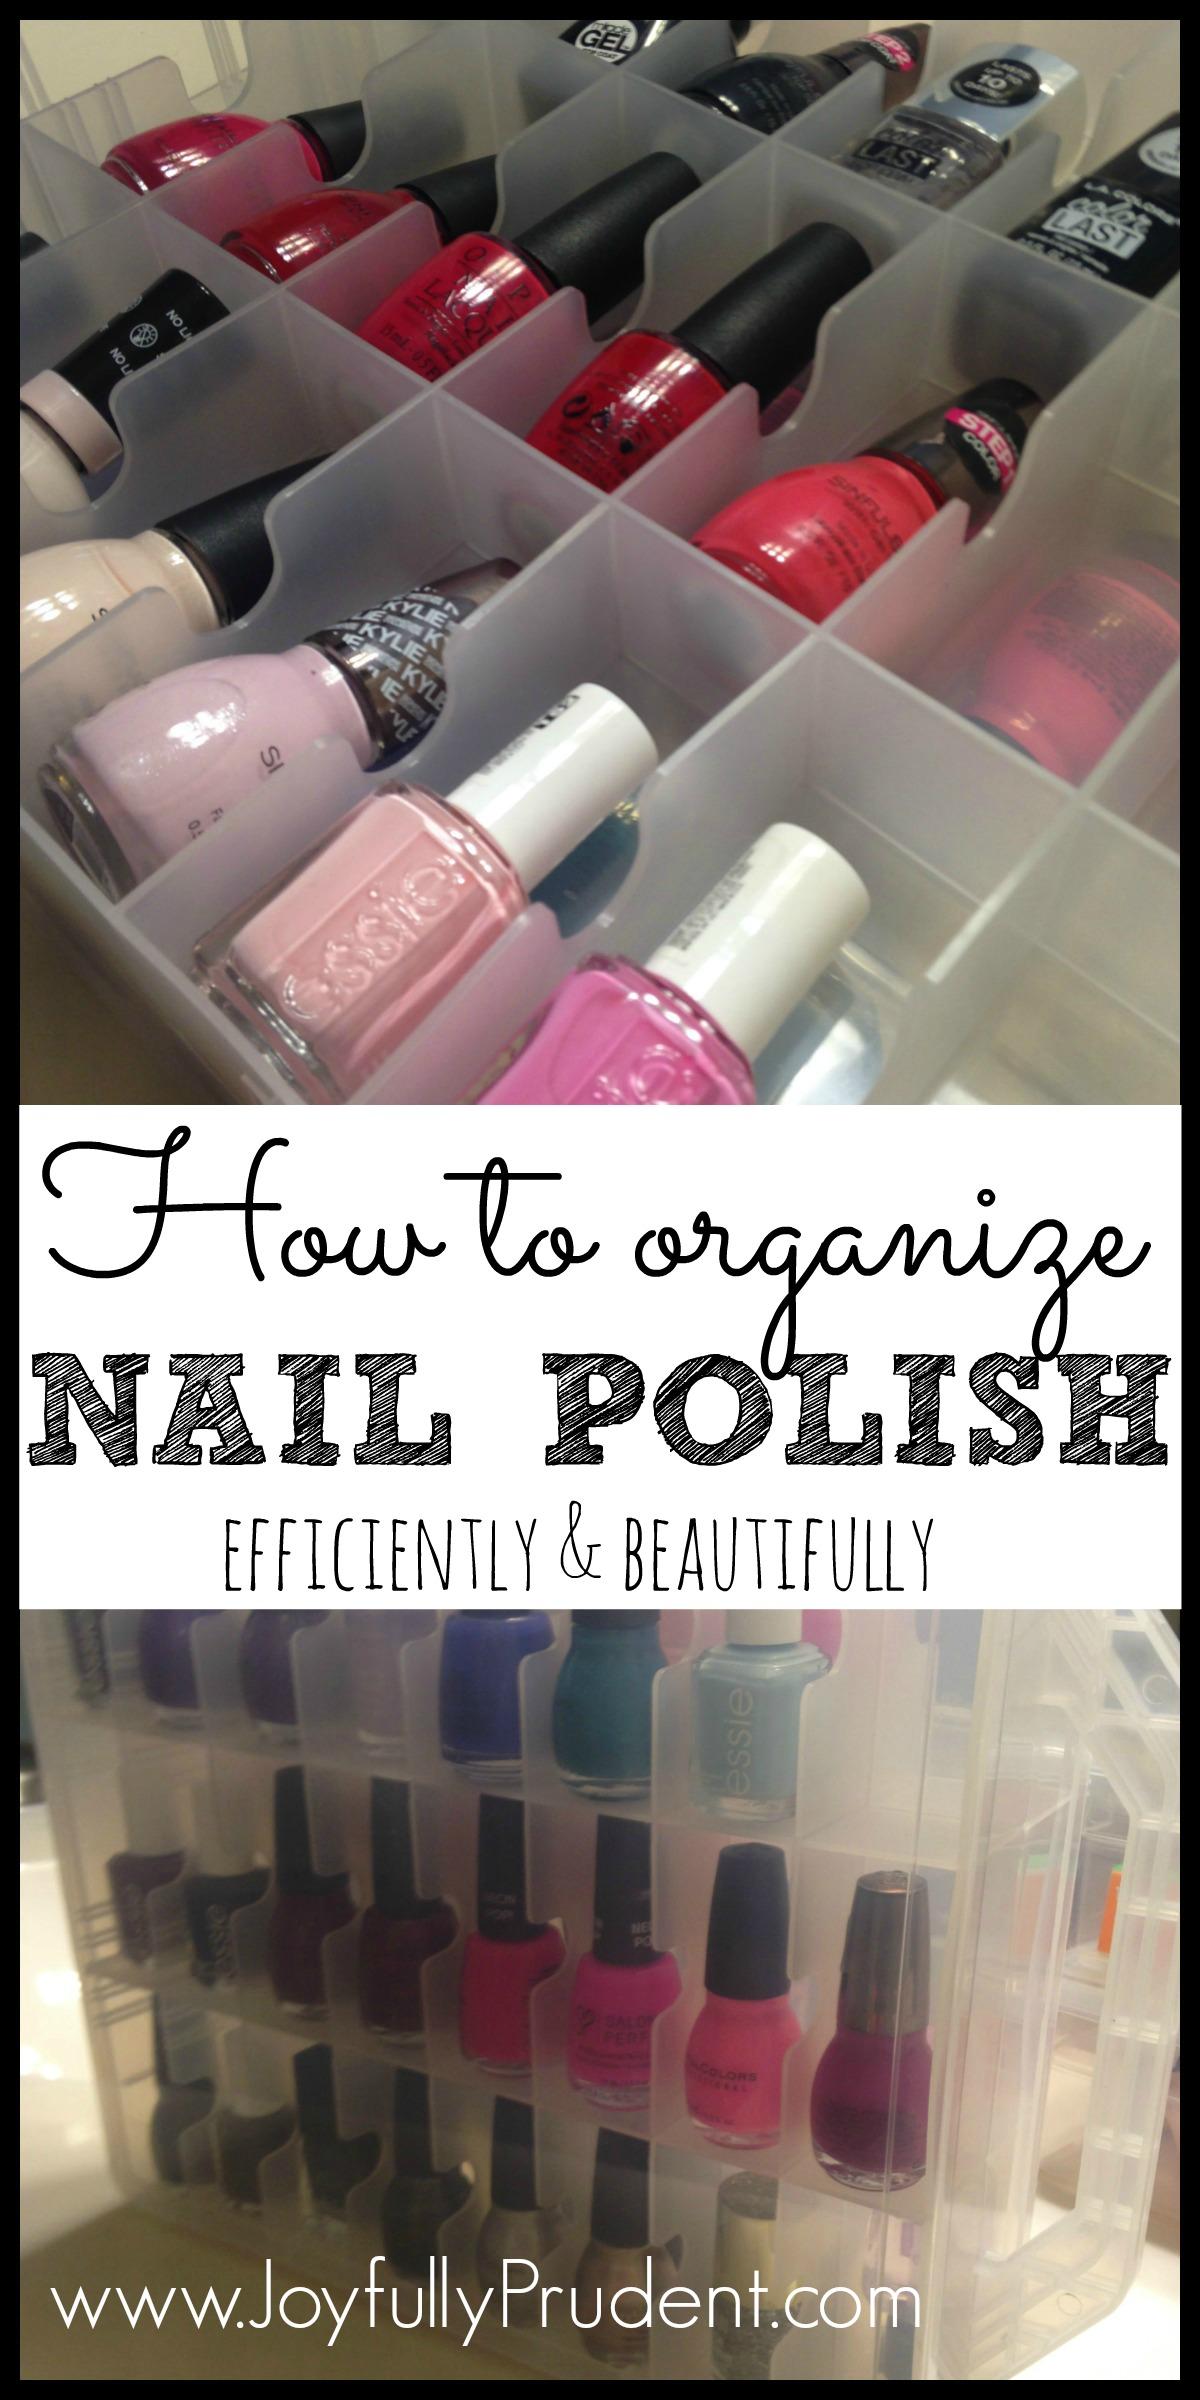 Organized Nail Polish - Joyfully Prudent